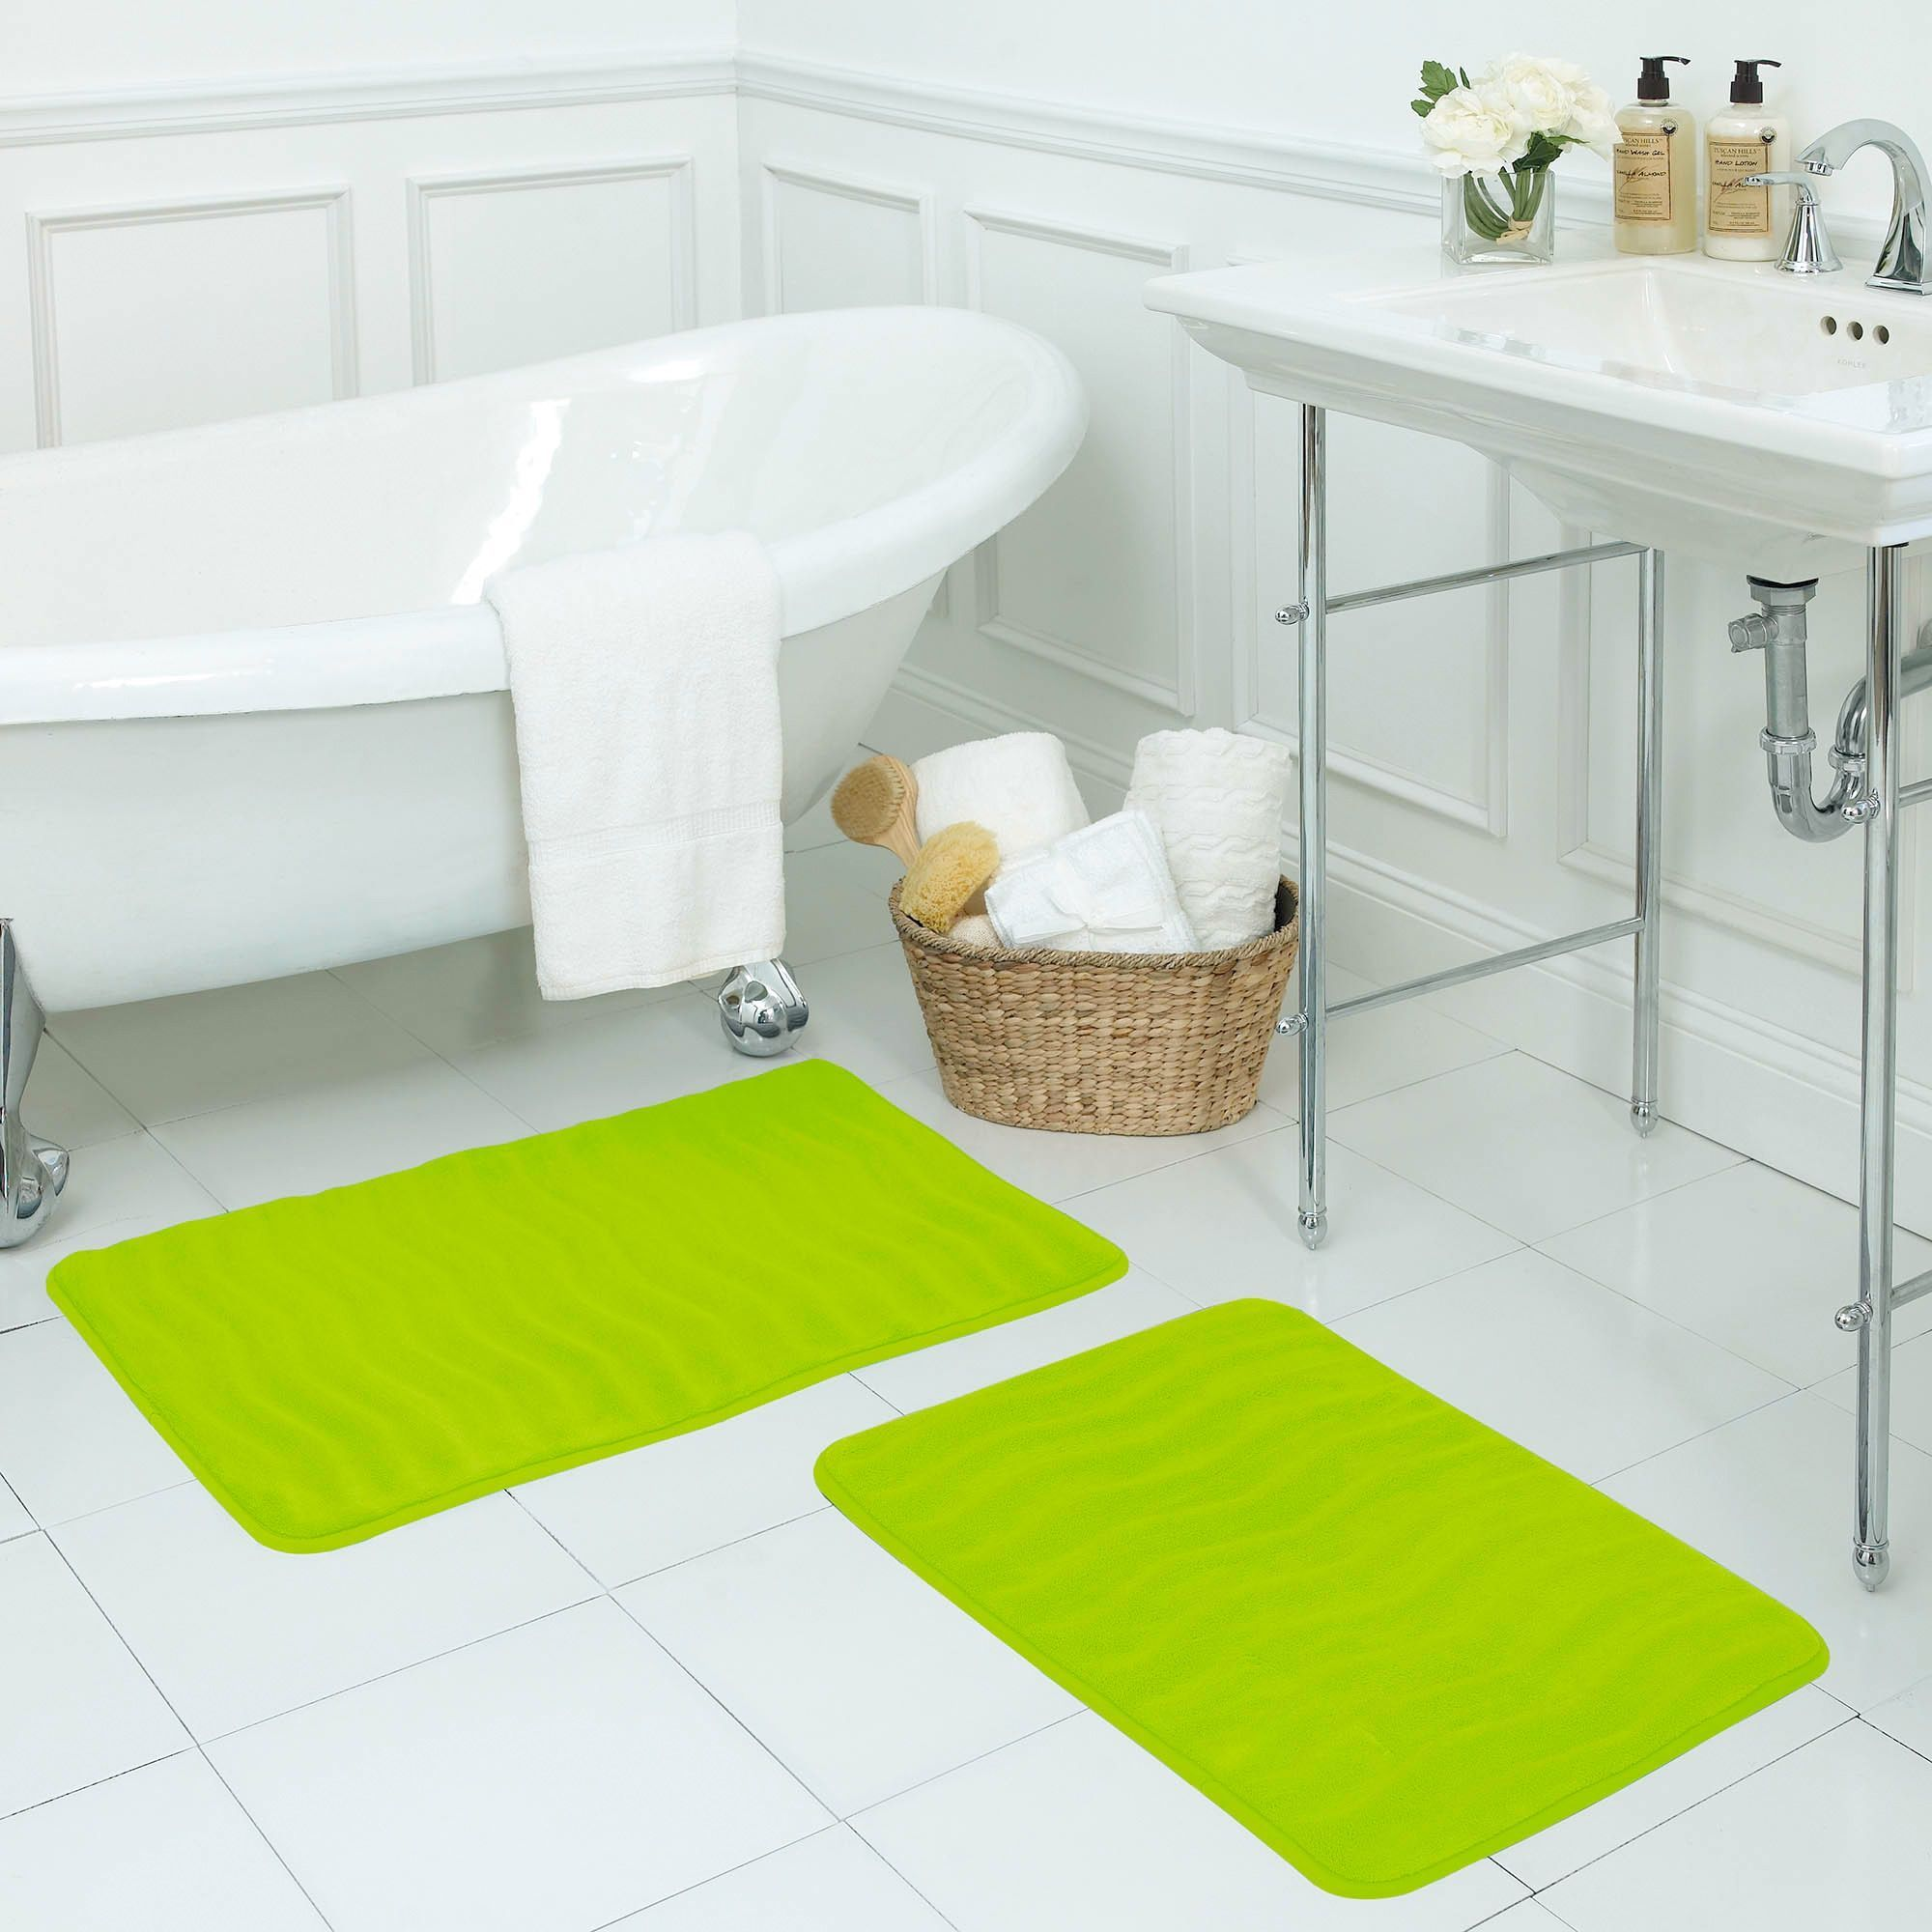 Bathroom Products 3pcs Anti Slip Bathroom Mat Set Non-slip Fish Scale Bath Mat Bathroom Kitchen Vintage Wood Pattern Print Carpet Doormats Decor Fine Craftsmanship